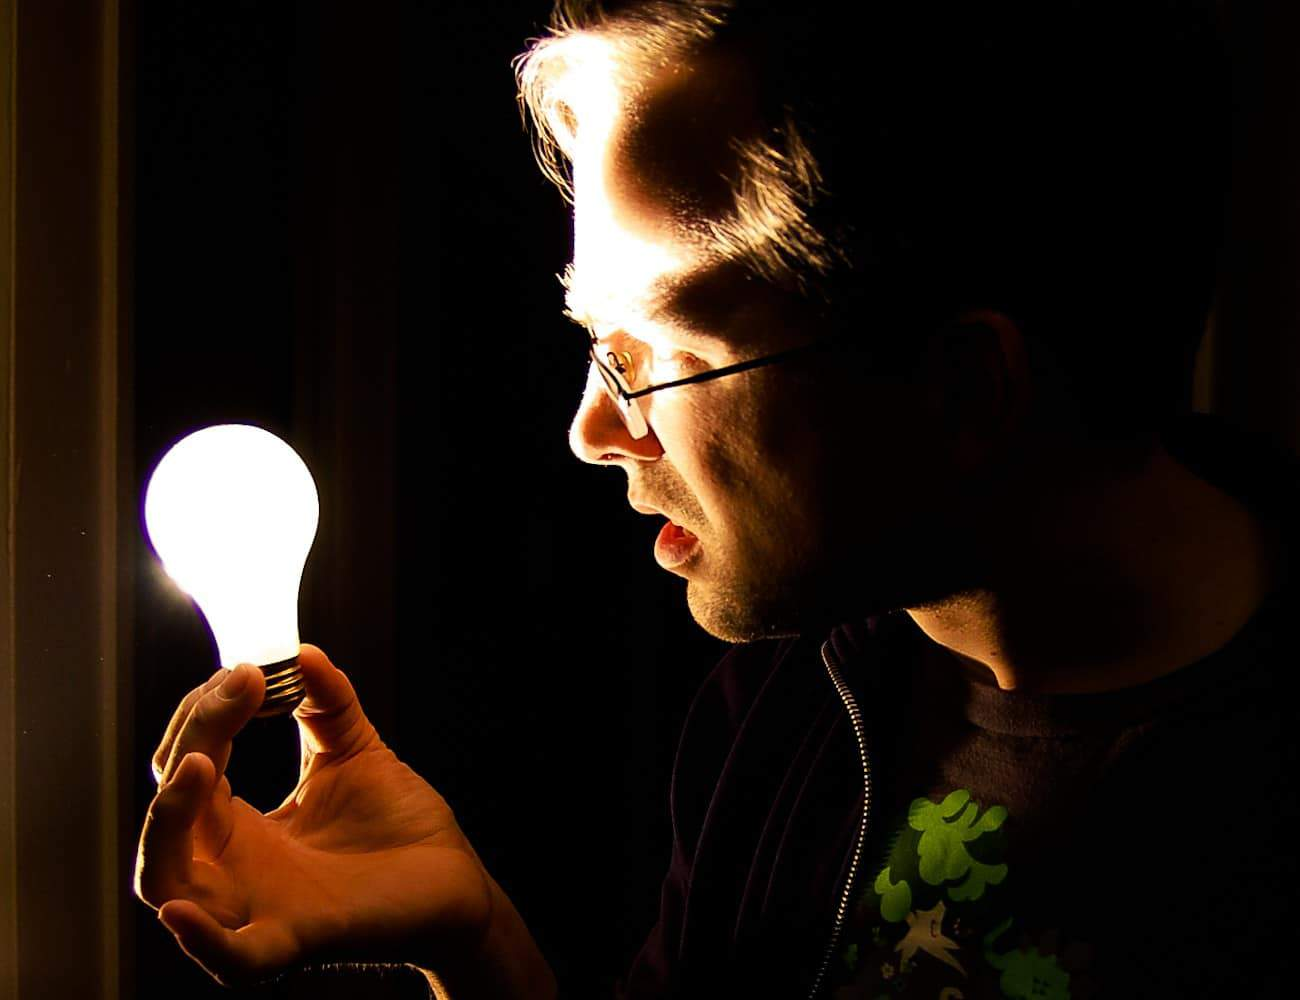 Man holding lightbuld. Procurement improvement requires enlightenment